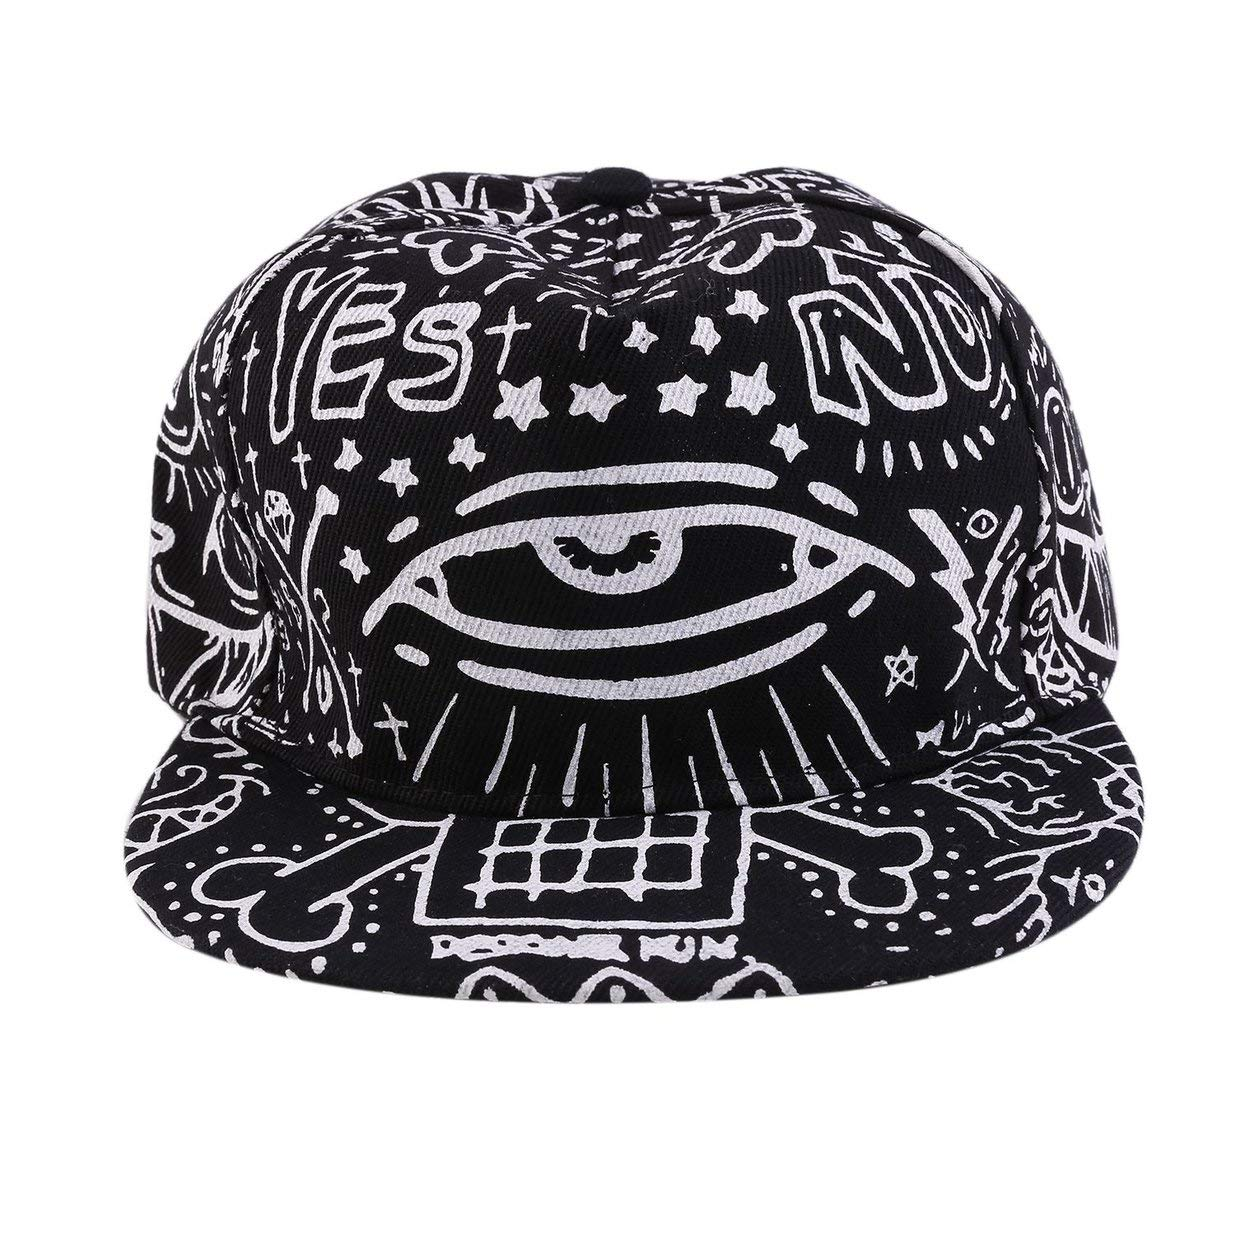 Banbie8409 Fashion Light In Dark Night Luminous Glow Snapback Baseball Hip-Hop Cap Hat-black